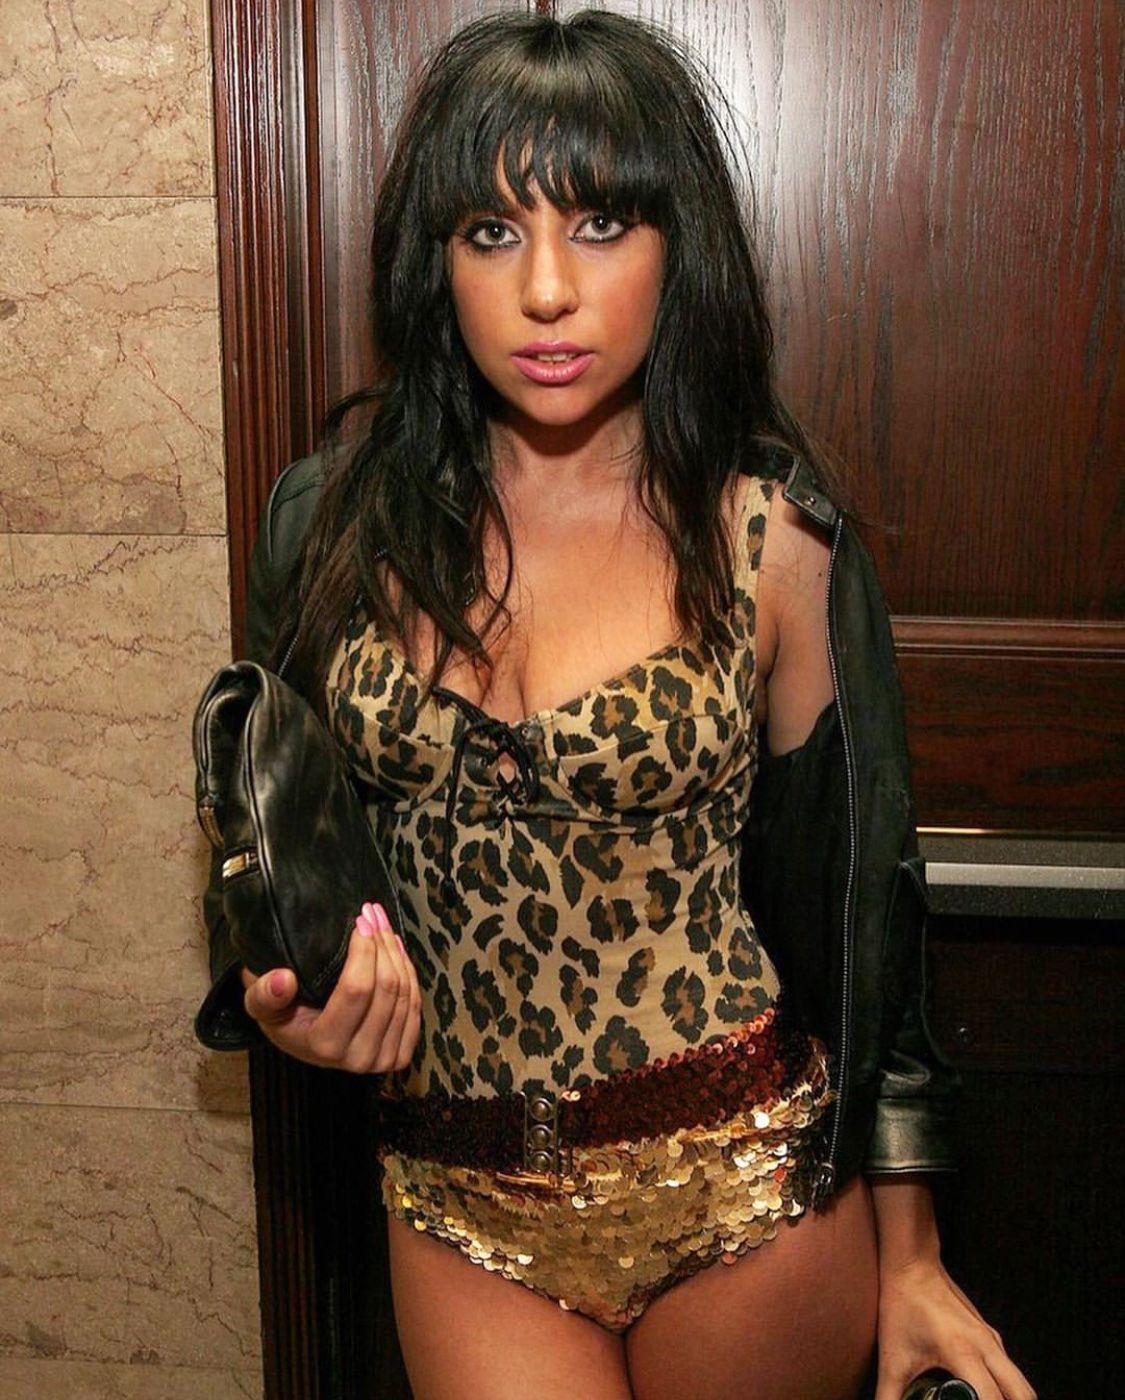 Dark Haired Stefani Germanotta Before She Was Gaga Lady Gaga Photos Lady Gaga